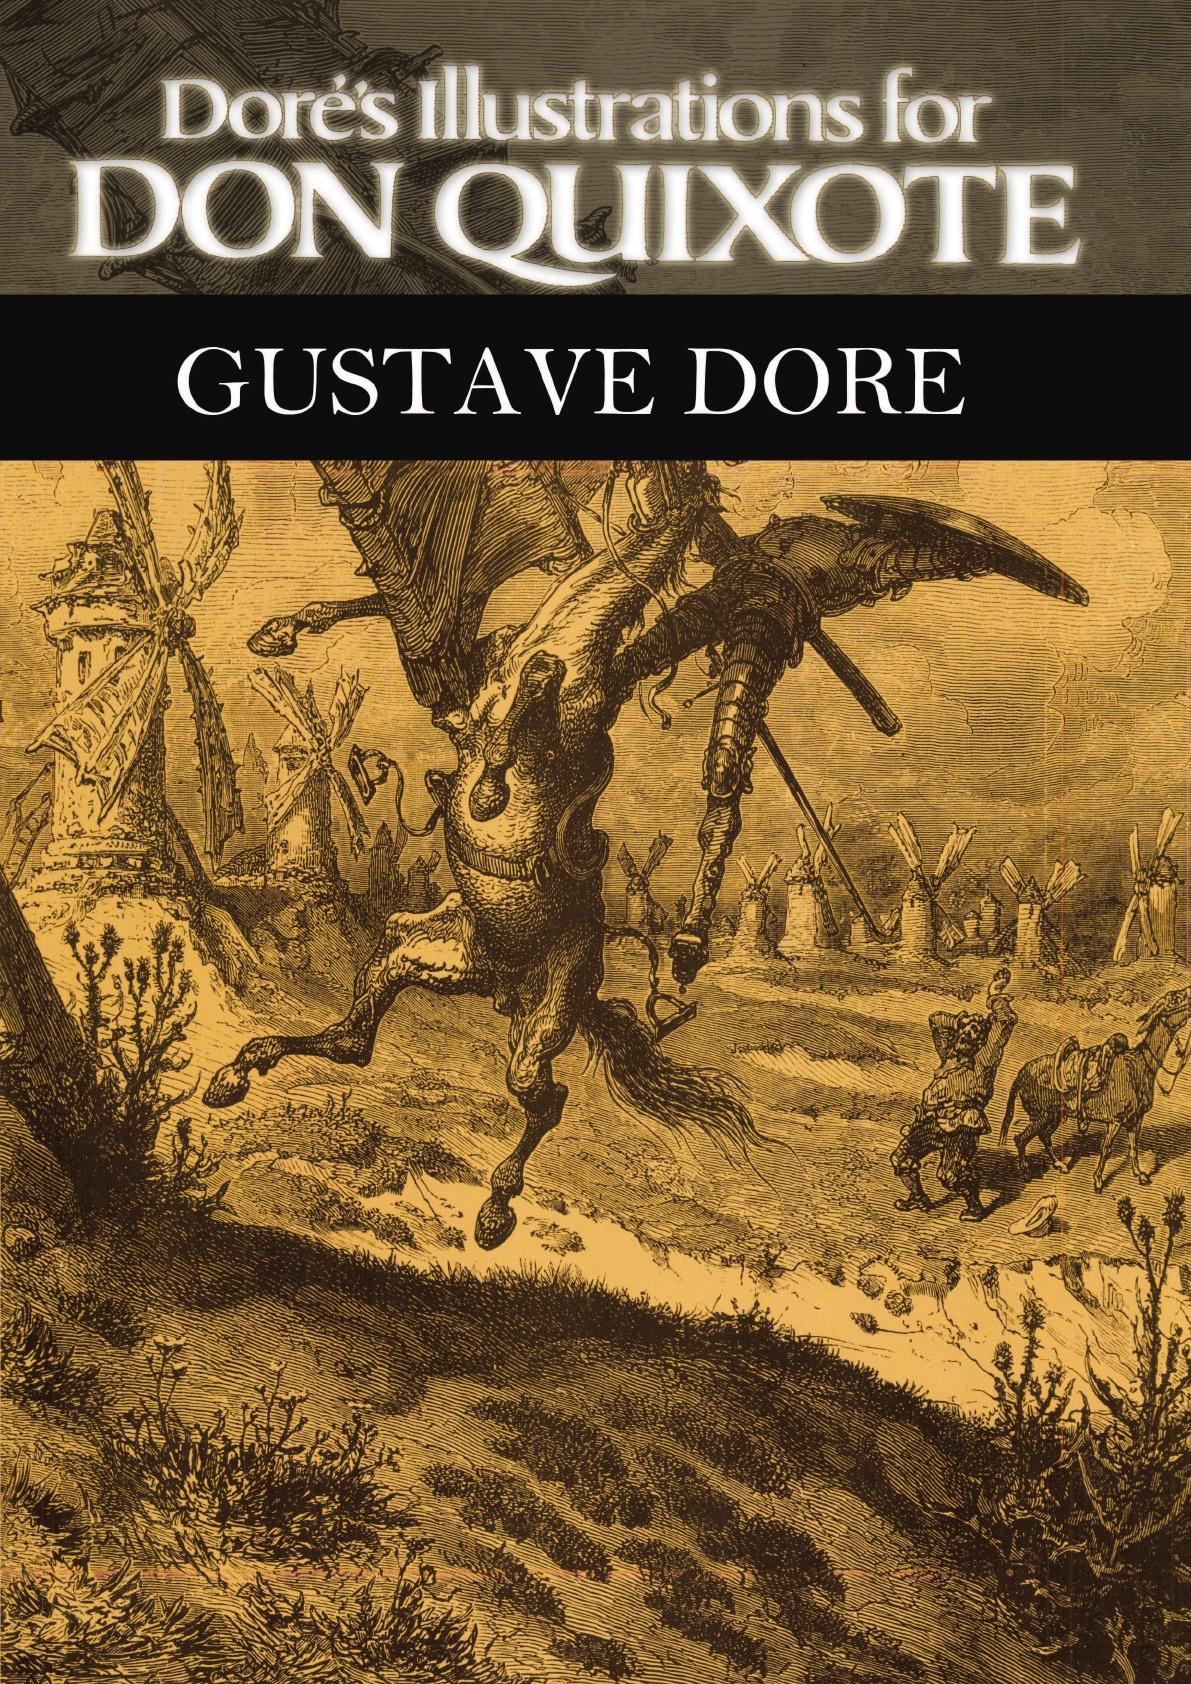 Gustave Dore Dore's Illustrations for Don Quixote full page bookmark magnifier